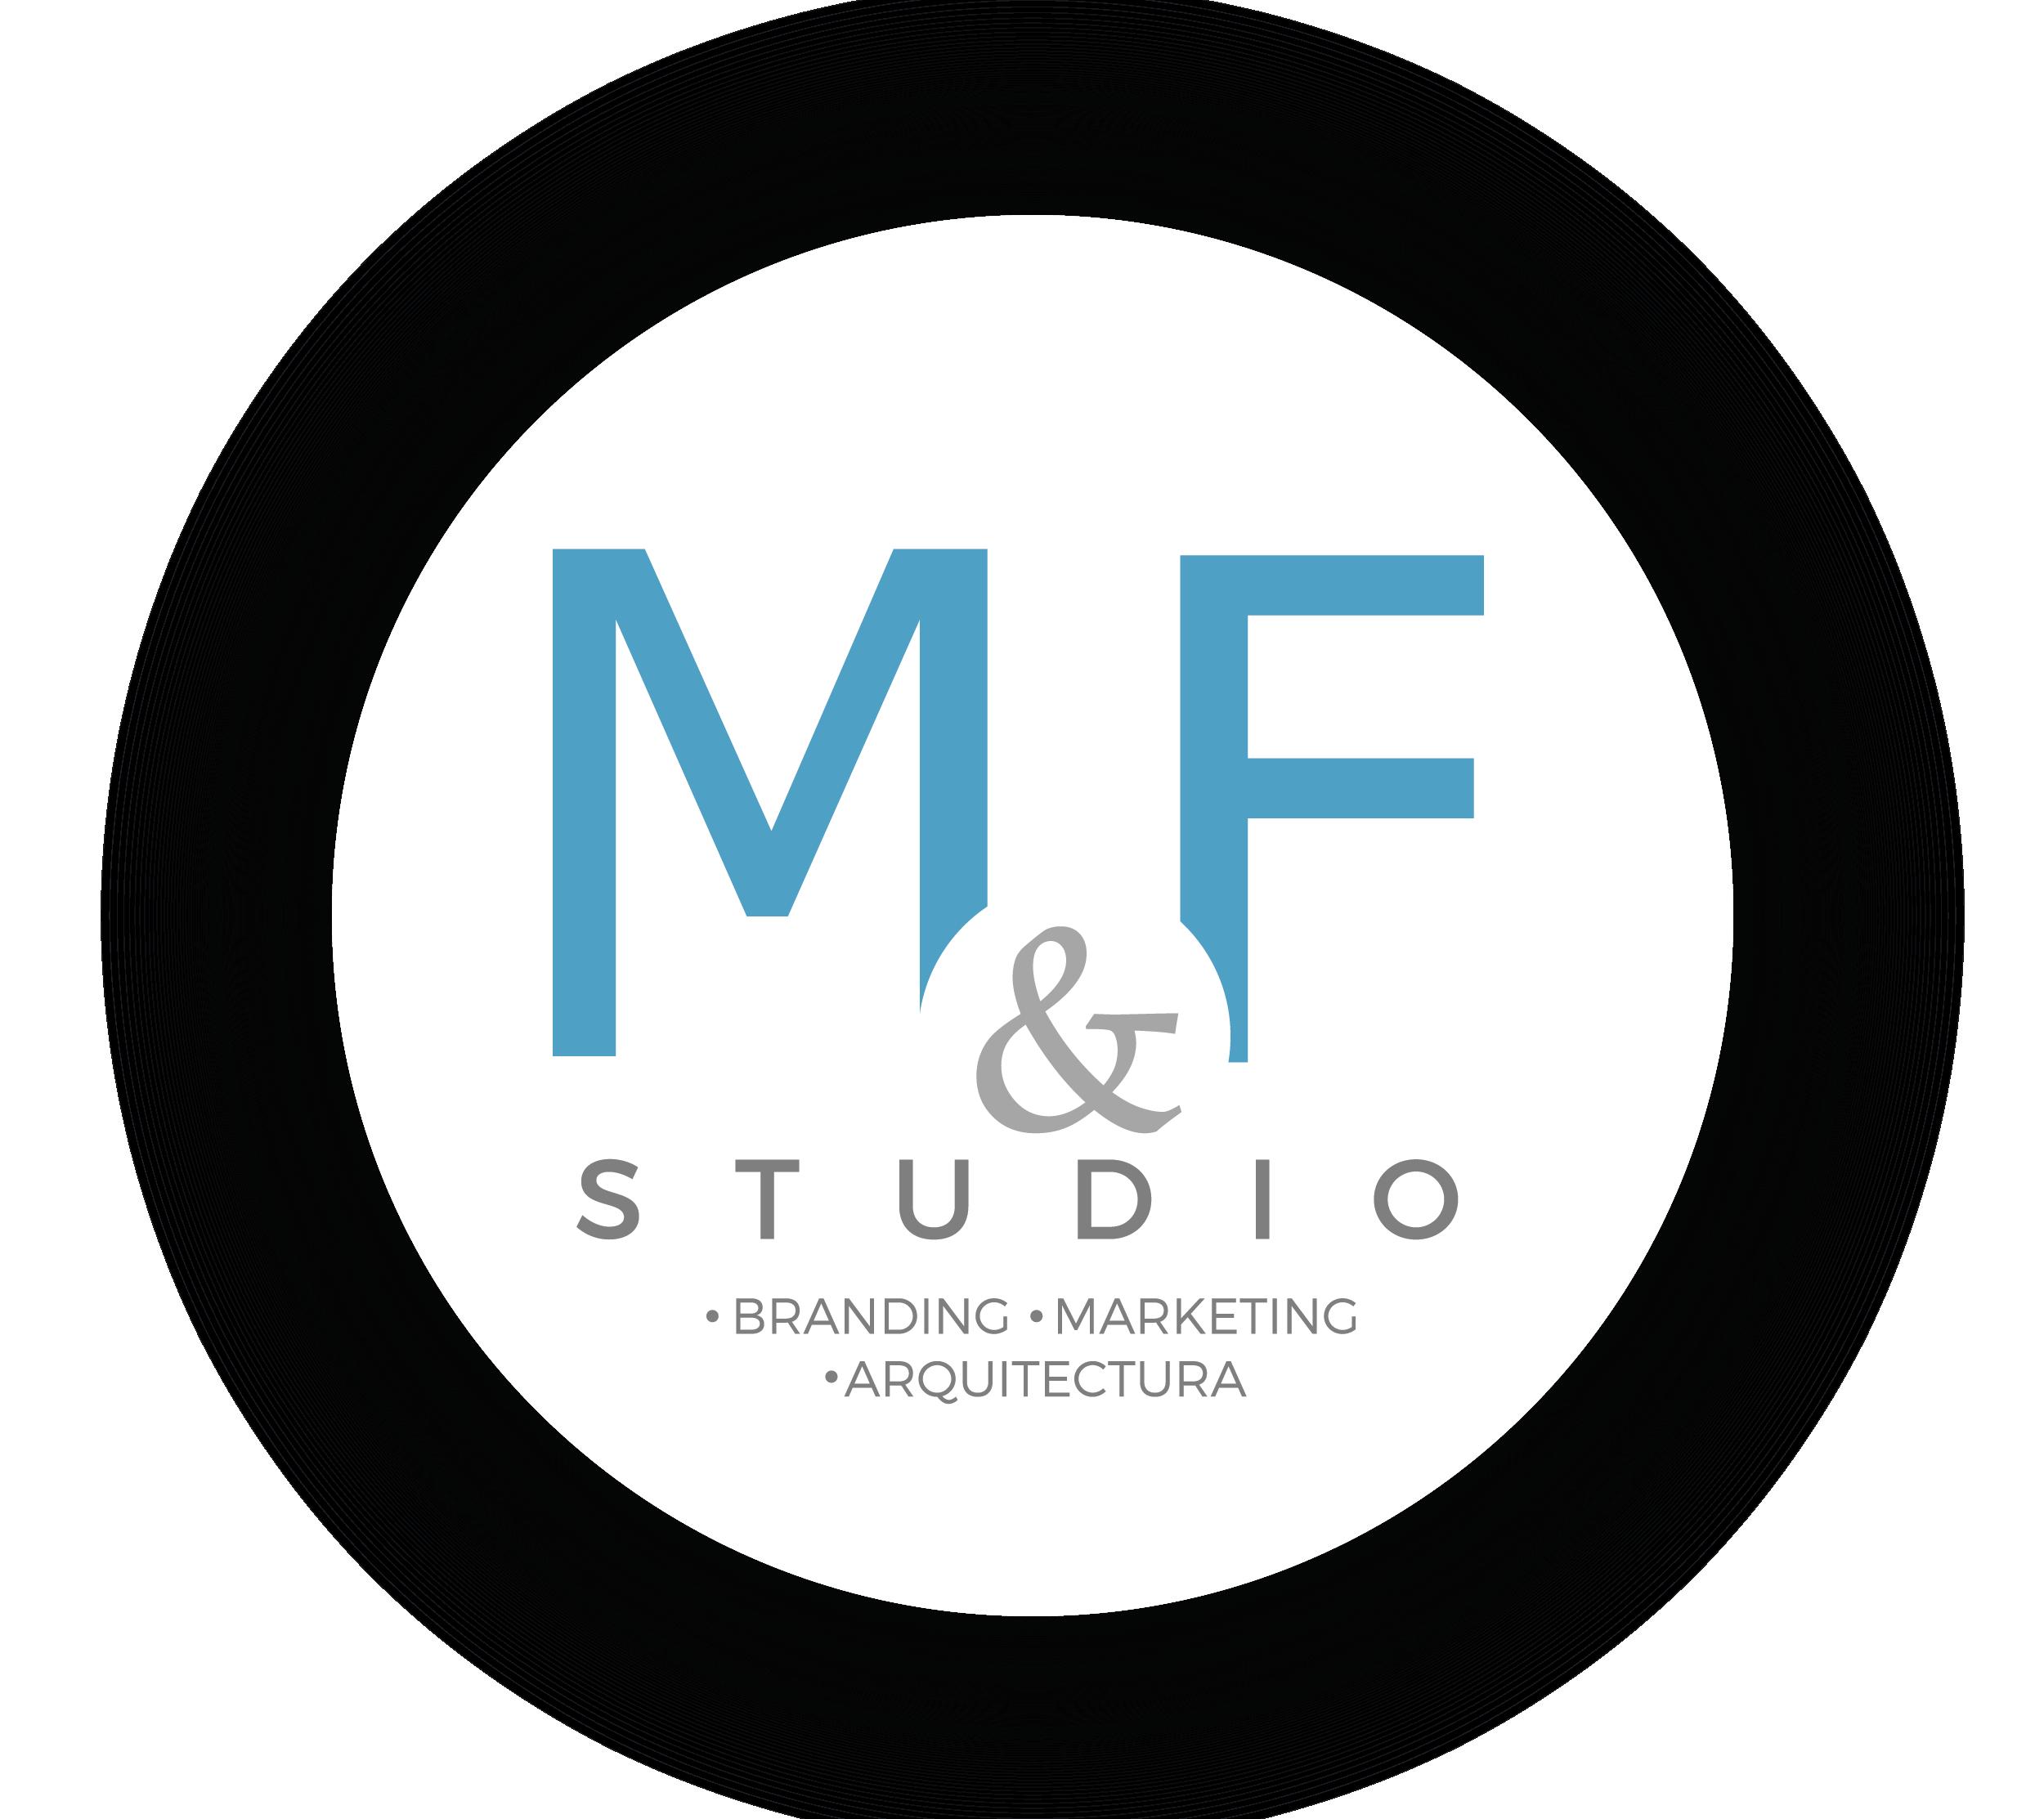 M&F STUDIO